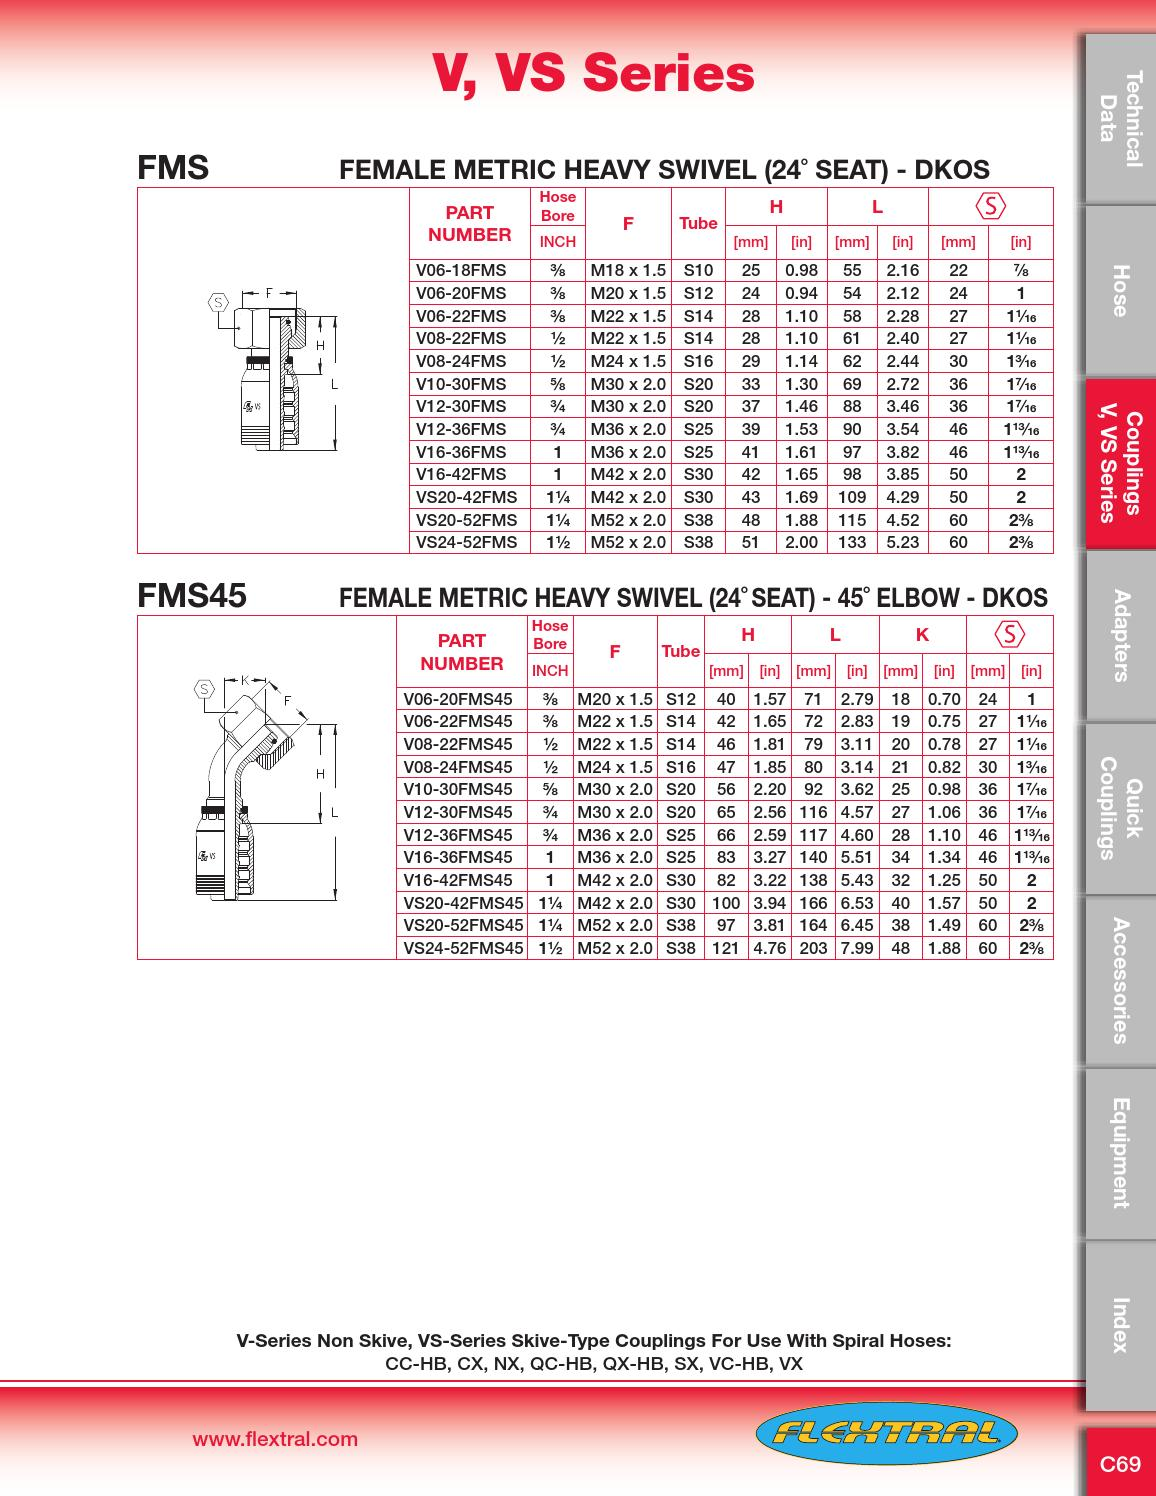 Flextral Hydraulic Hose Fitting Catalog By The Oilfield Store S A De C V Issuu Фитинг dn 38 dkos 52х2 (38) (ш) s=55. issuu